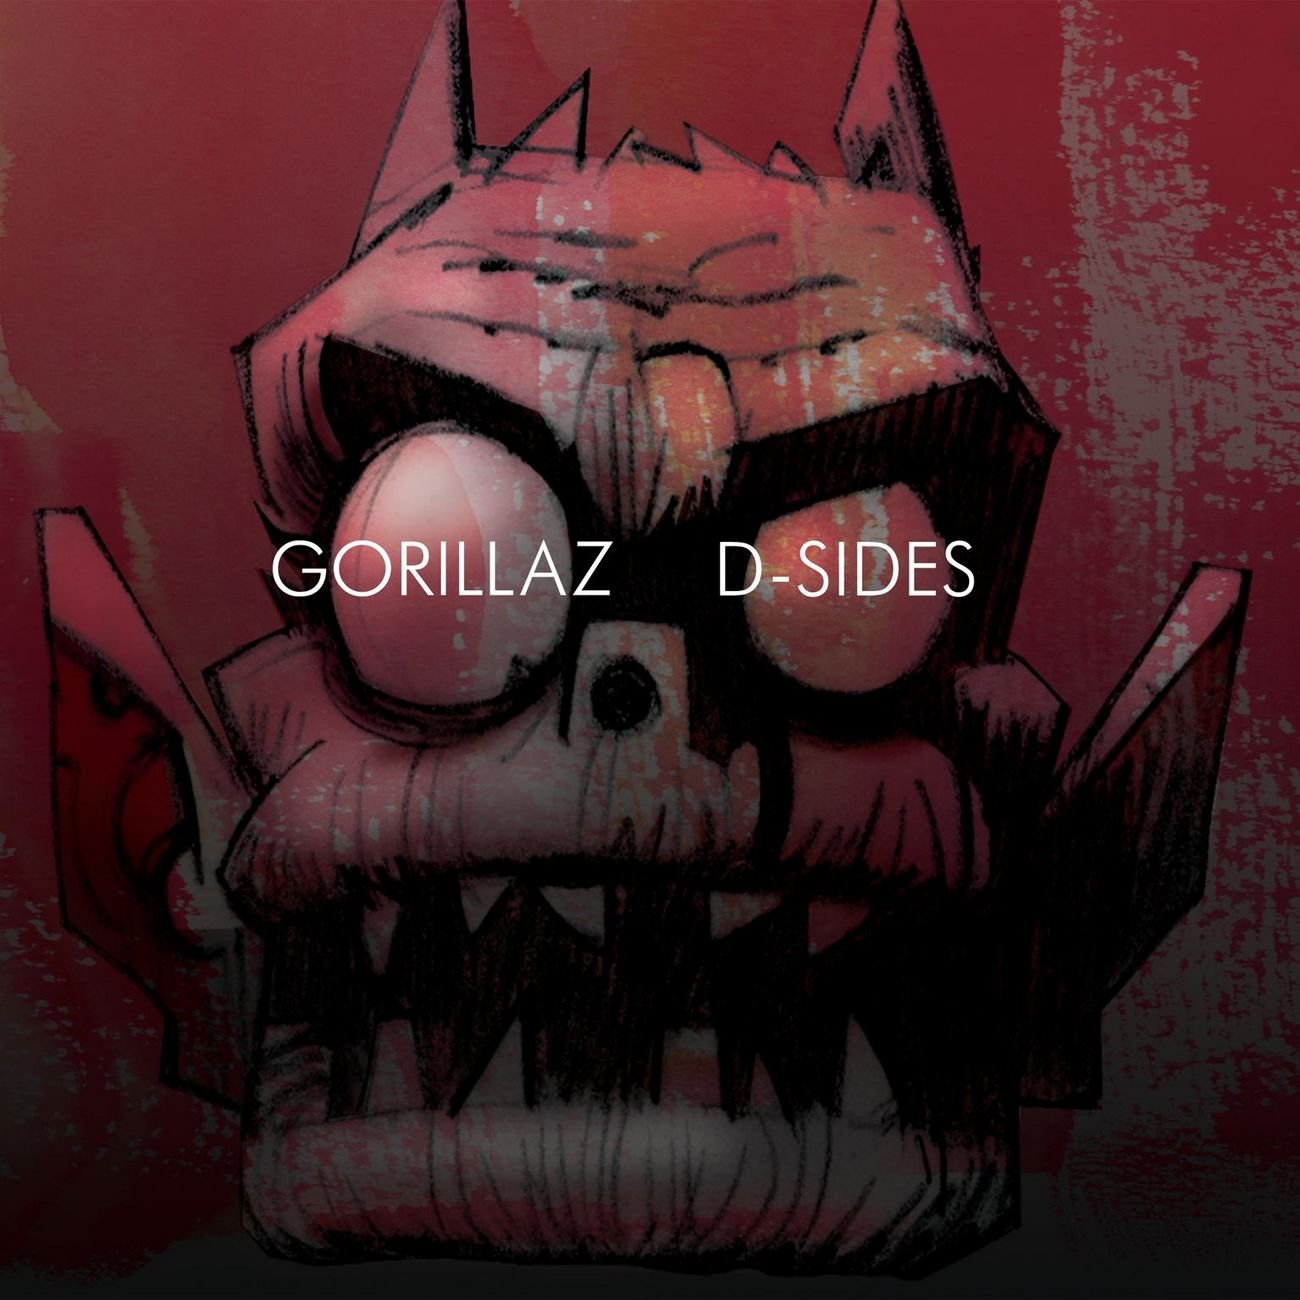 Gorillaz - D-Sides [3xLP] (RSD20)